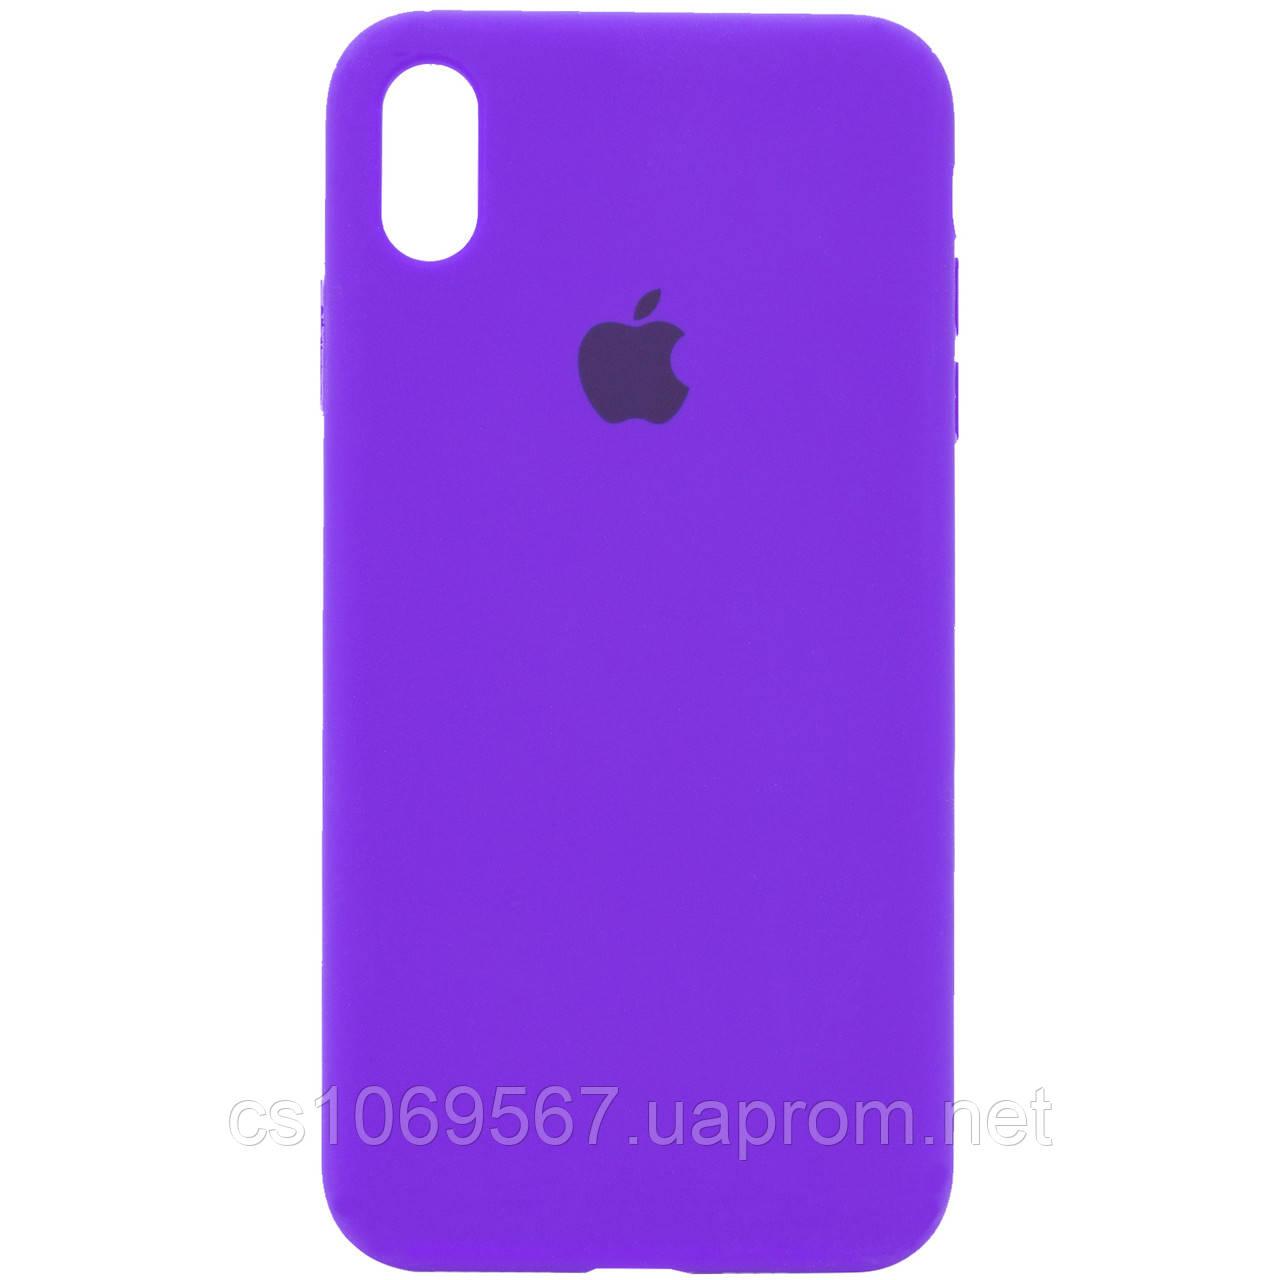 "Чехол Silicone Case Full Protective (AA) для Apple iPhone X (5.8"") / XS (5.8"")"